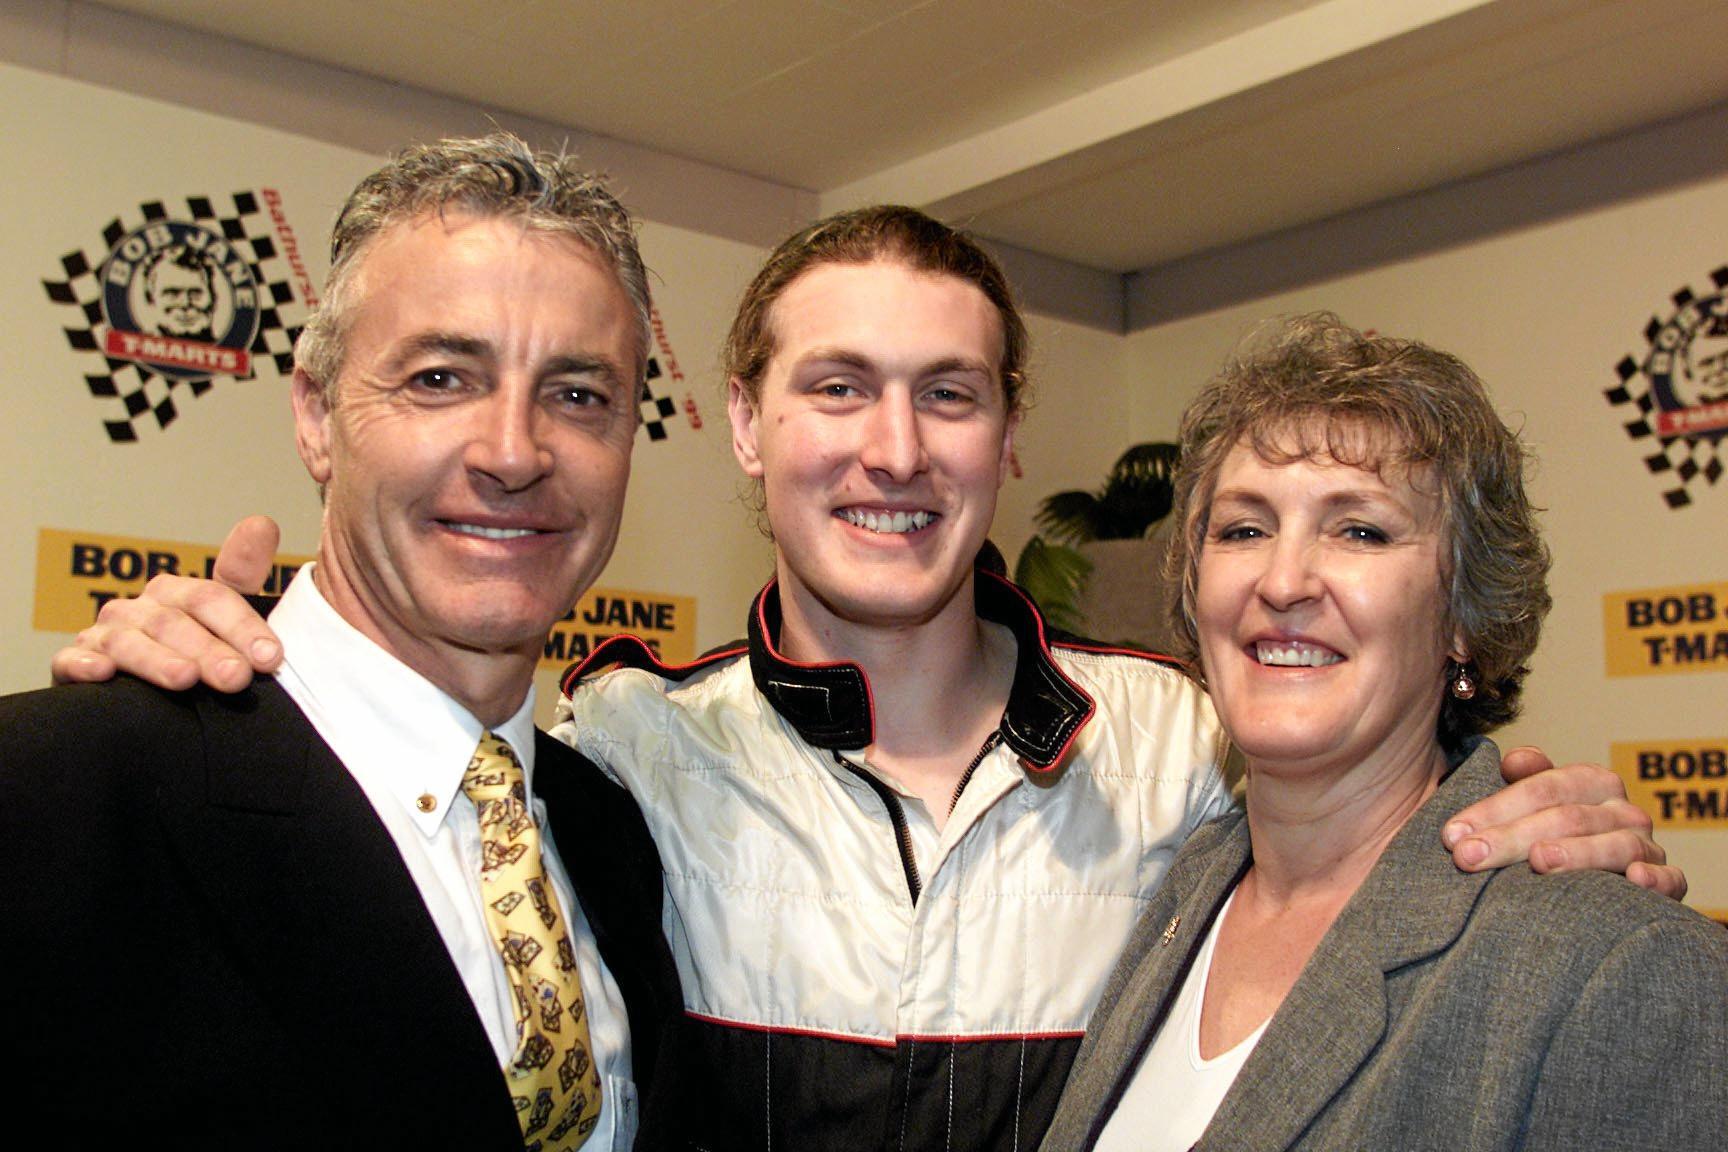 Peter Brock and Bev Brock with their son James Brock, after James won the Bathurst Tourers V8 300km race in 1999.